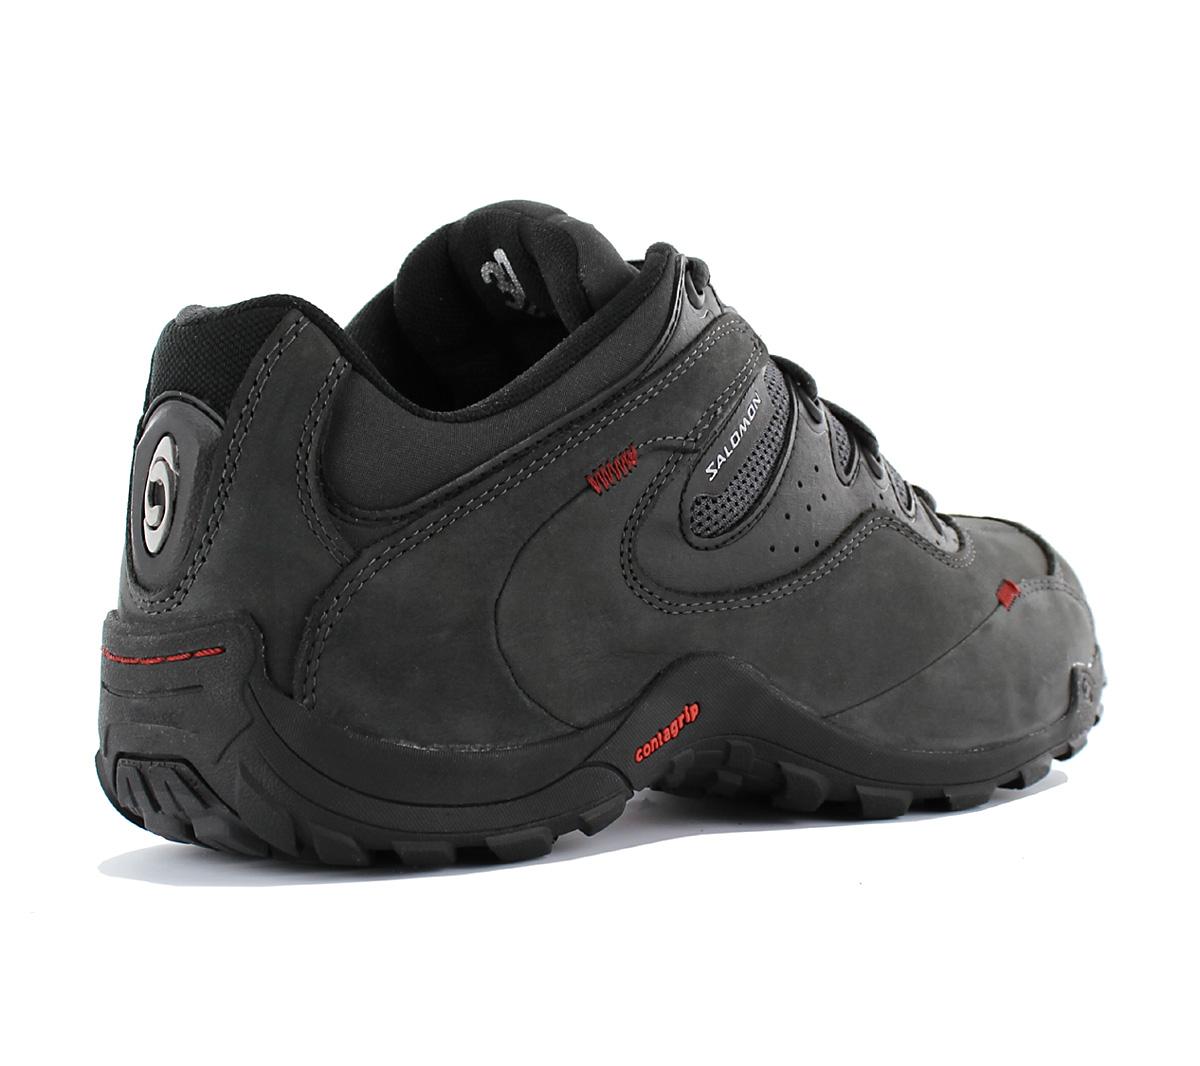 M Grey Salomon New Shoes Trekking Men's Outdoor Hiking Elios 2 OHqnxHwE7